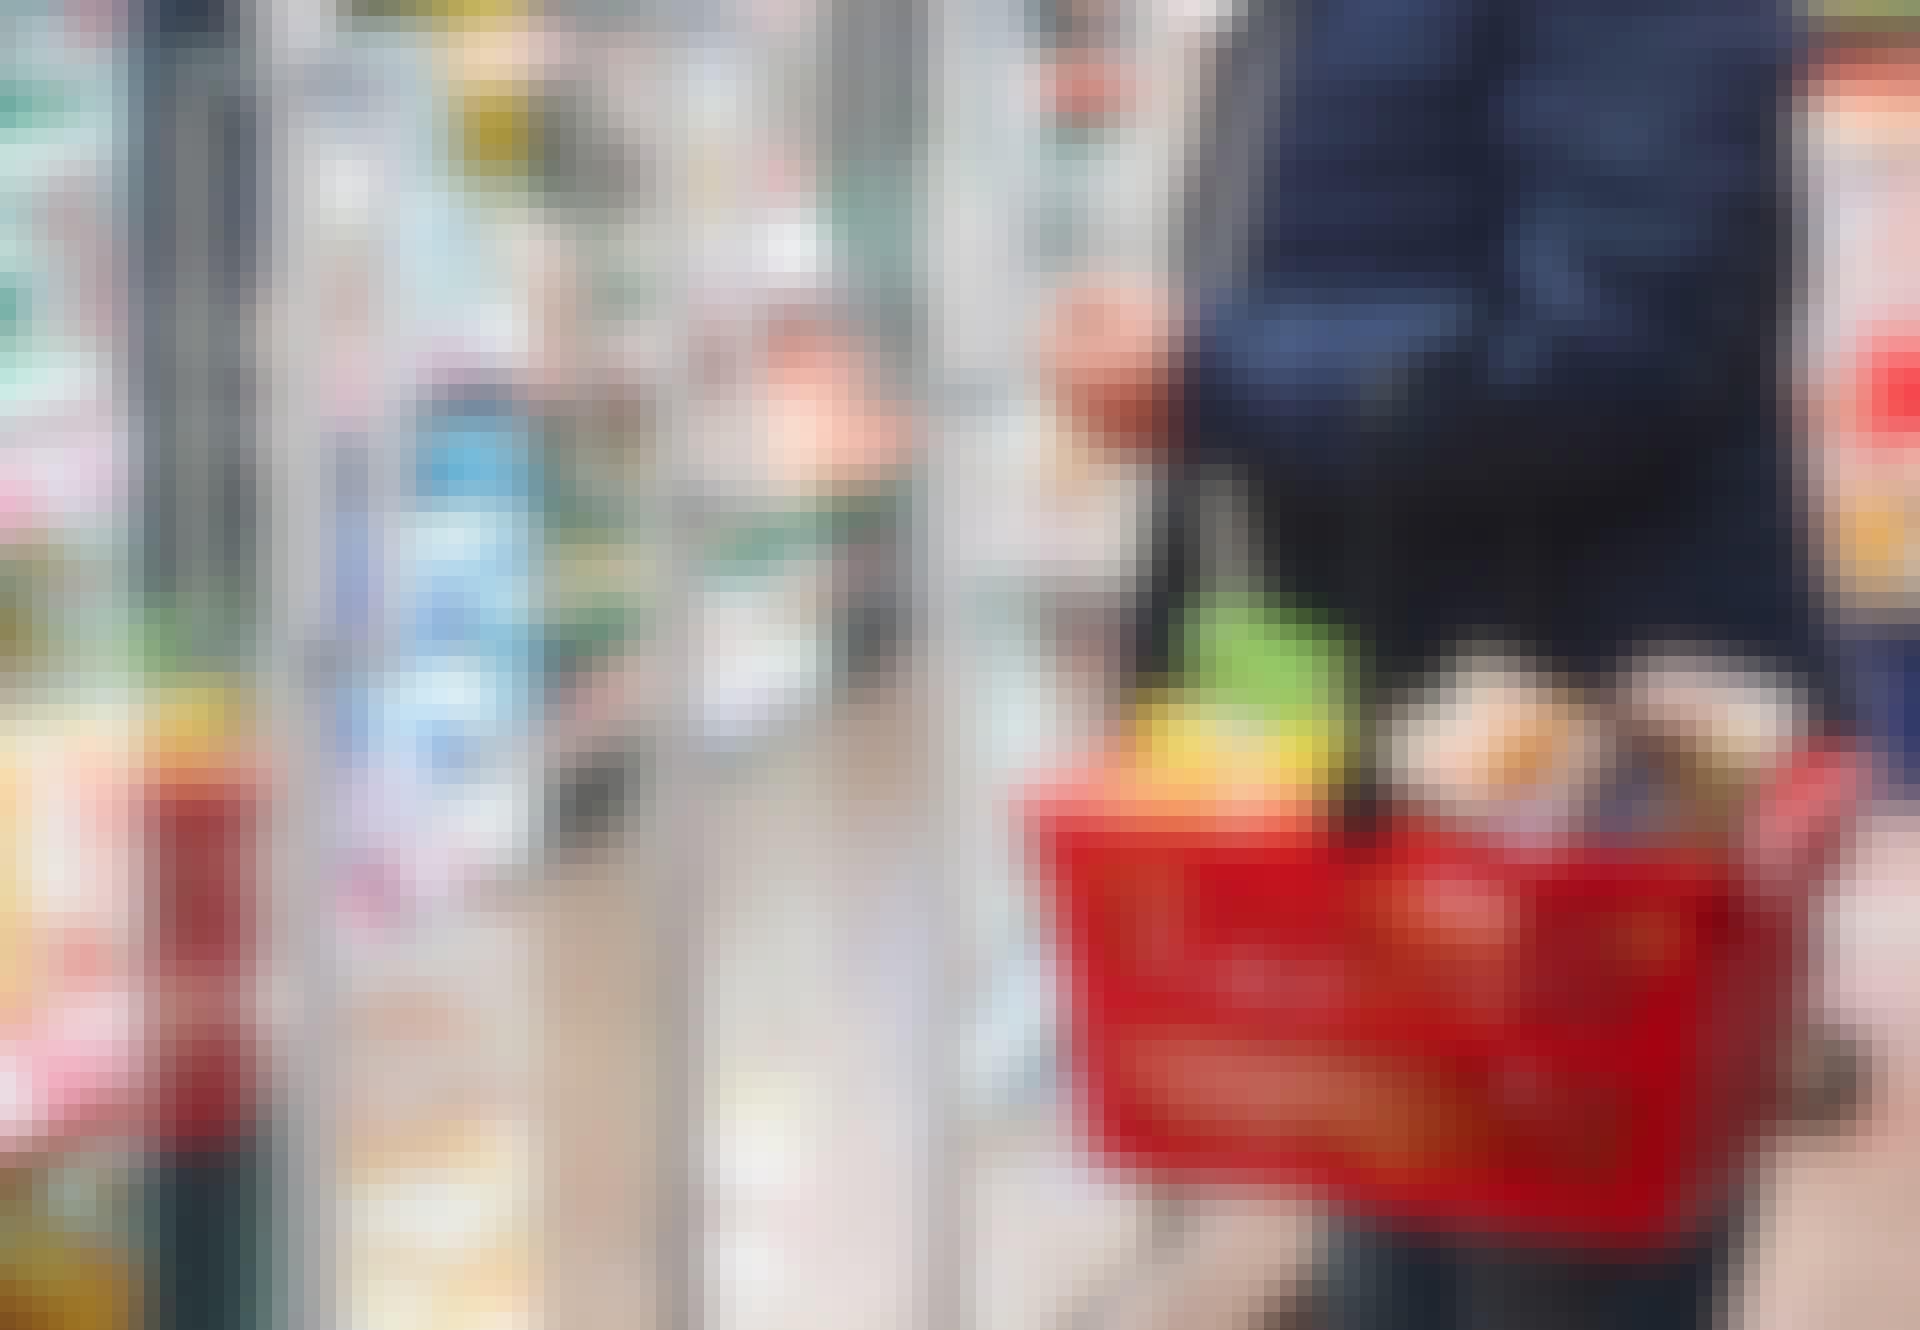 Mies ja ostoskori